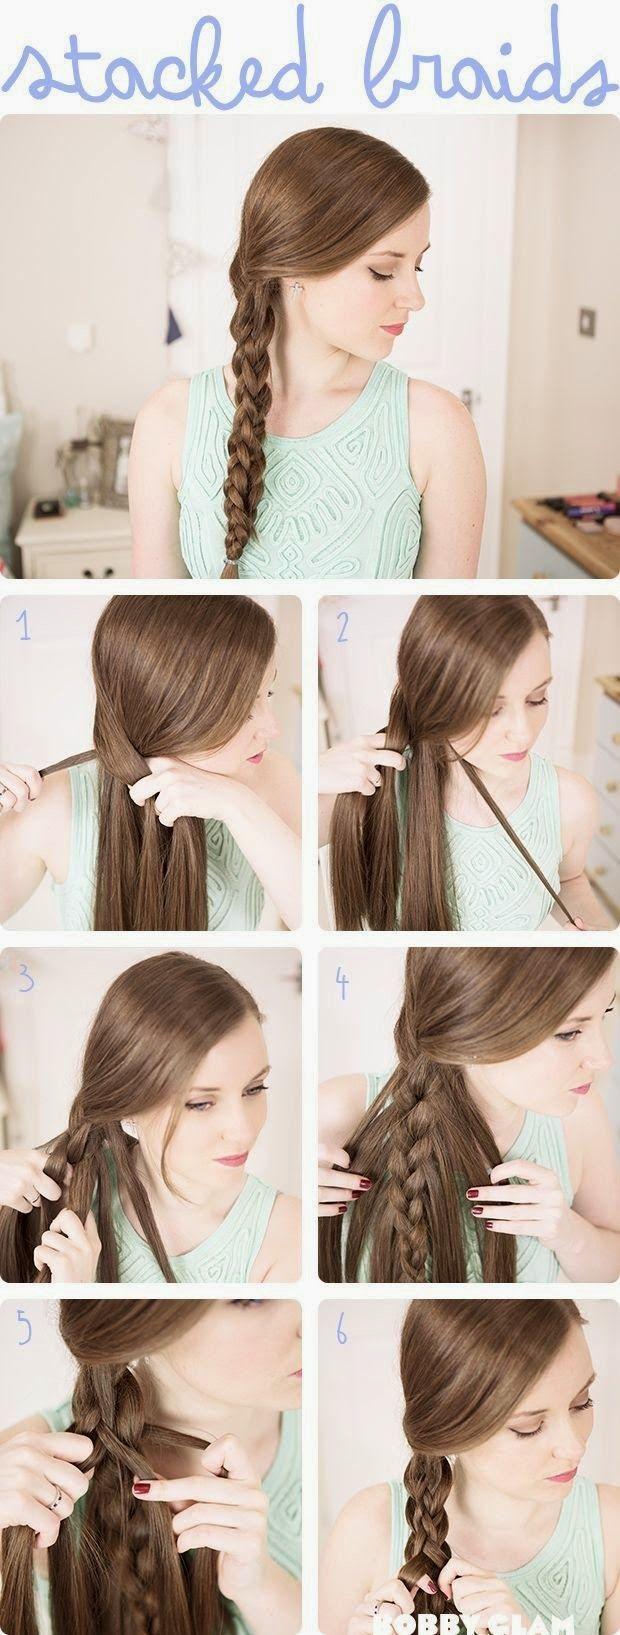 Cool Braids for Teens | popular hair tutorials 2014 for teens